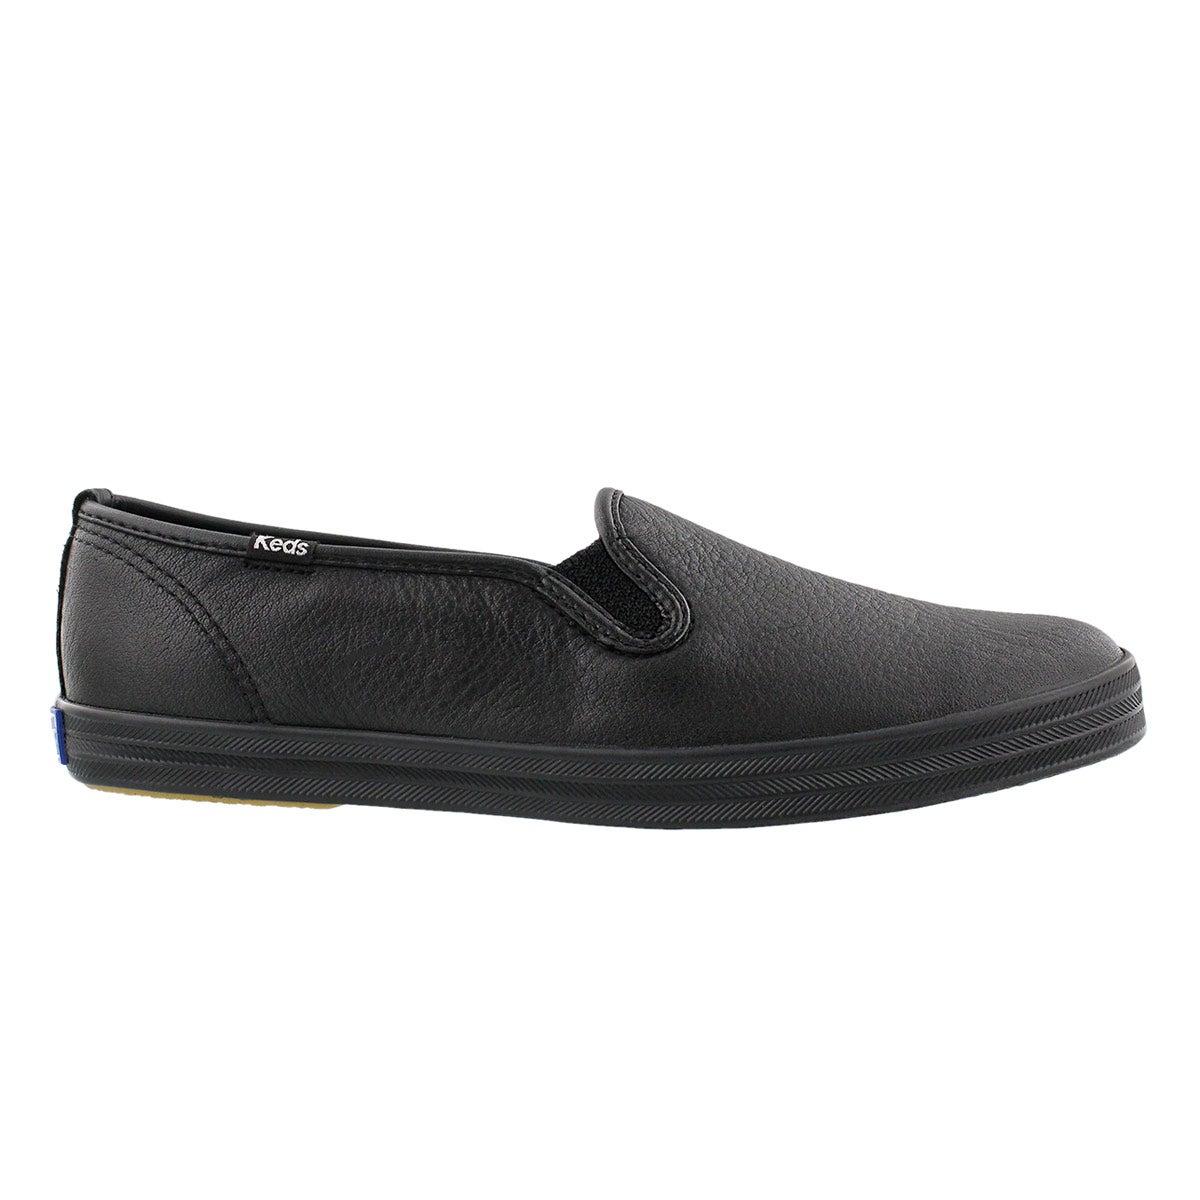 black leather keds slip ons